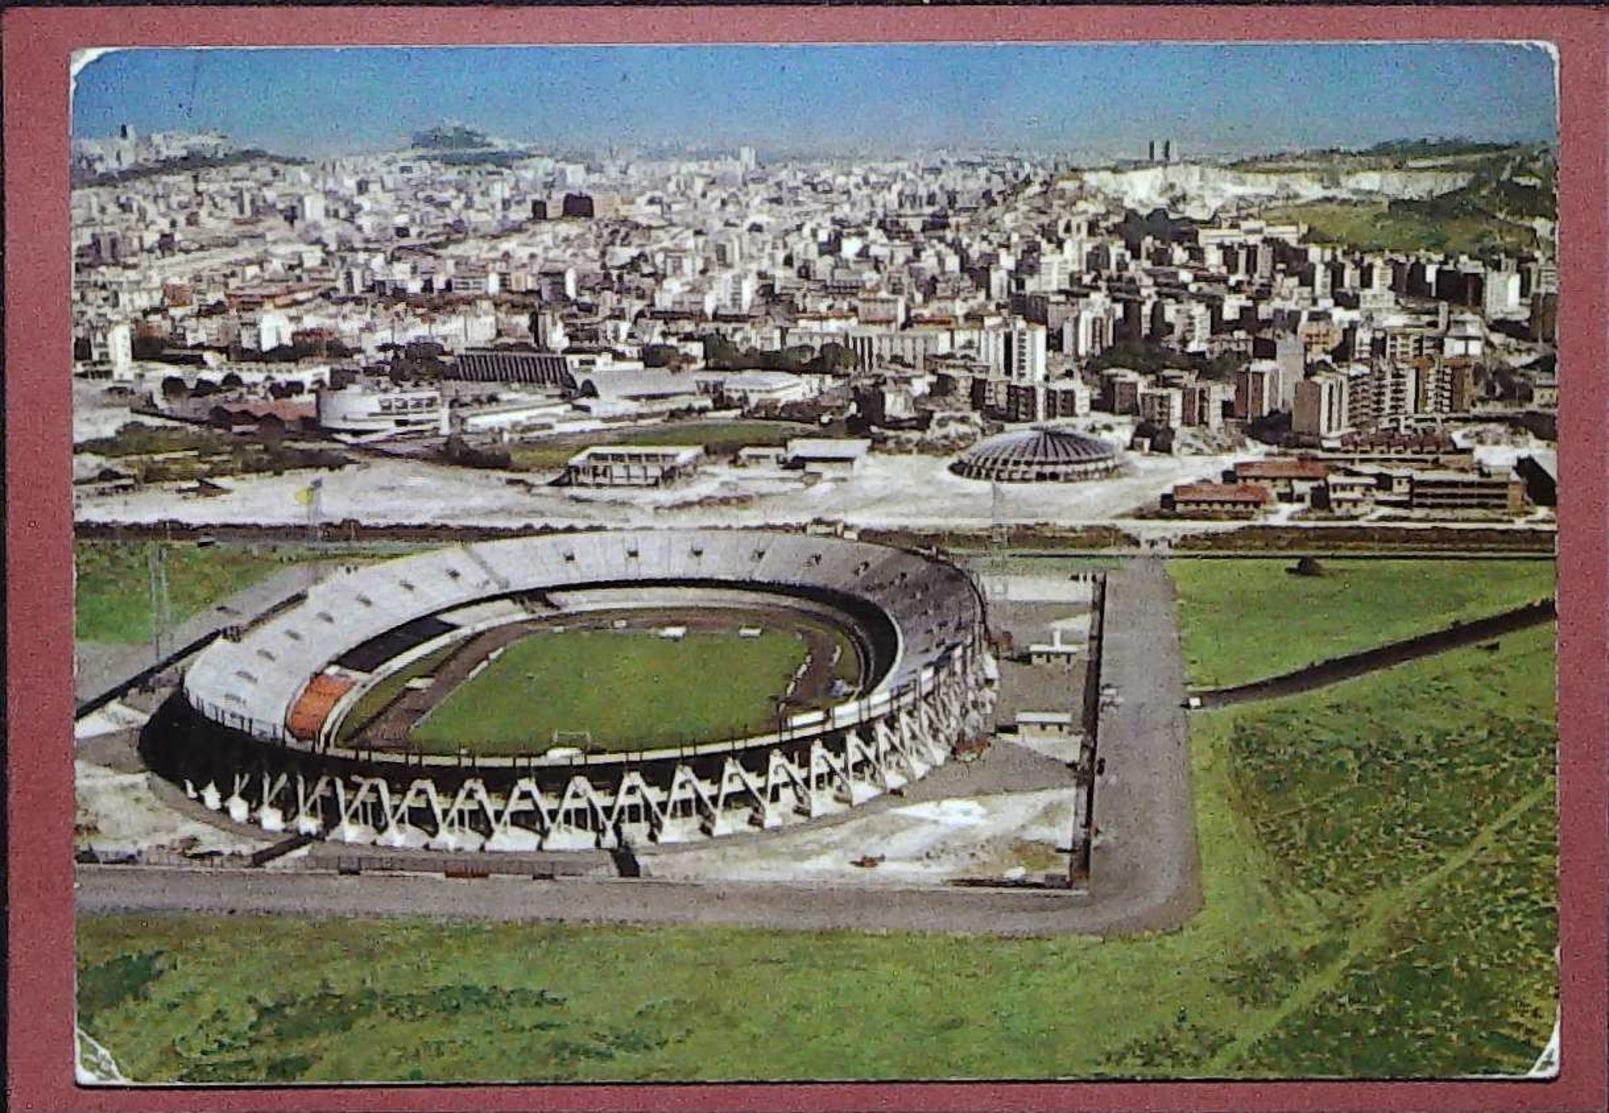 13 CAGLIARI - STADIO - ESTADIO - STADION - STADE - STADIUM - CALCIO - SOCCER - FOOTBALL - FOOT-BALL - FÚTBOL - Estadios